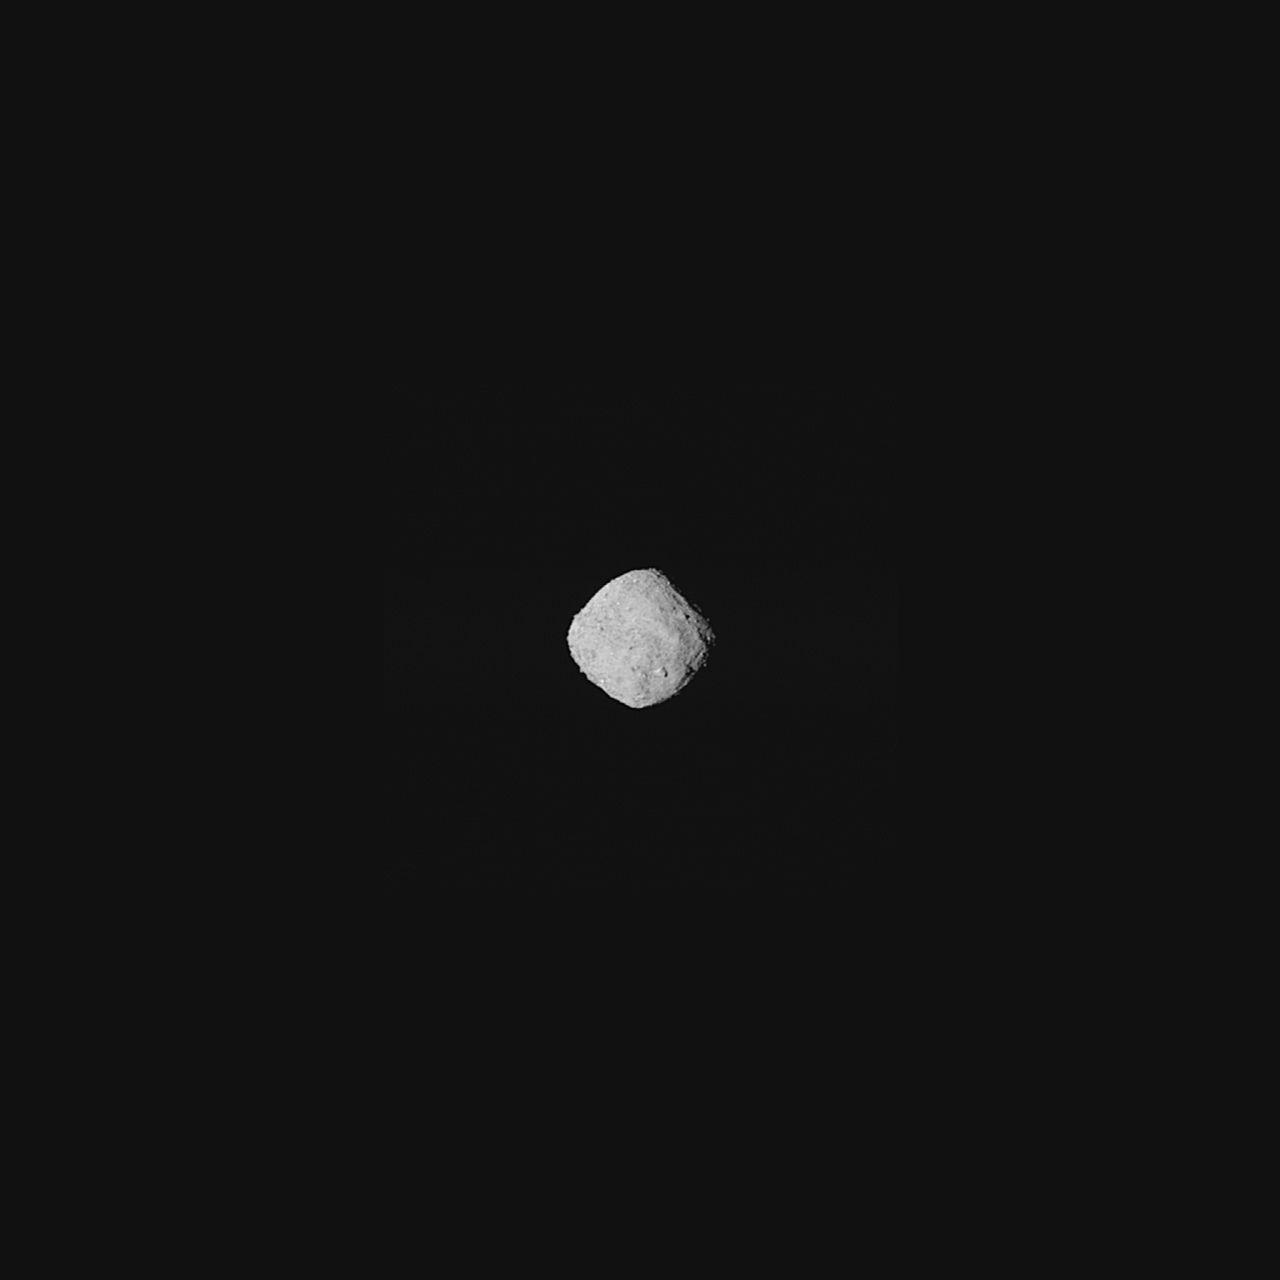 Nu är NASA:s asteroidjagare framme vid Bennu